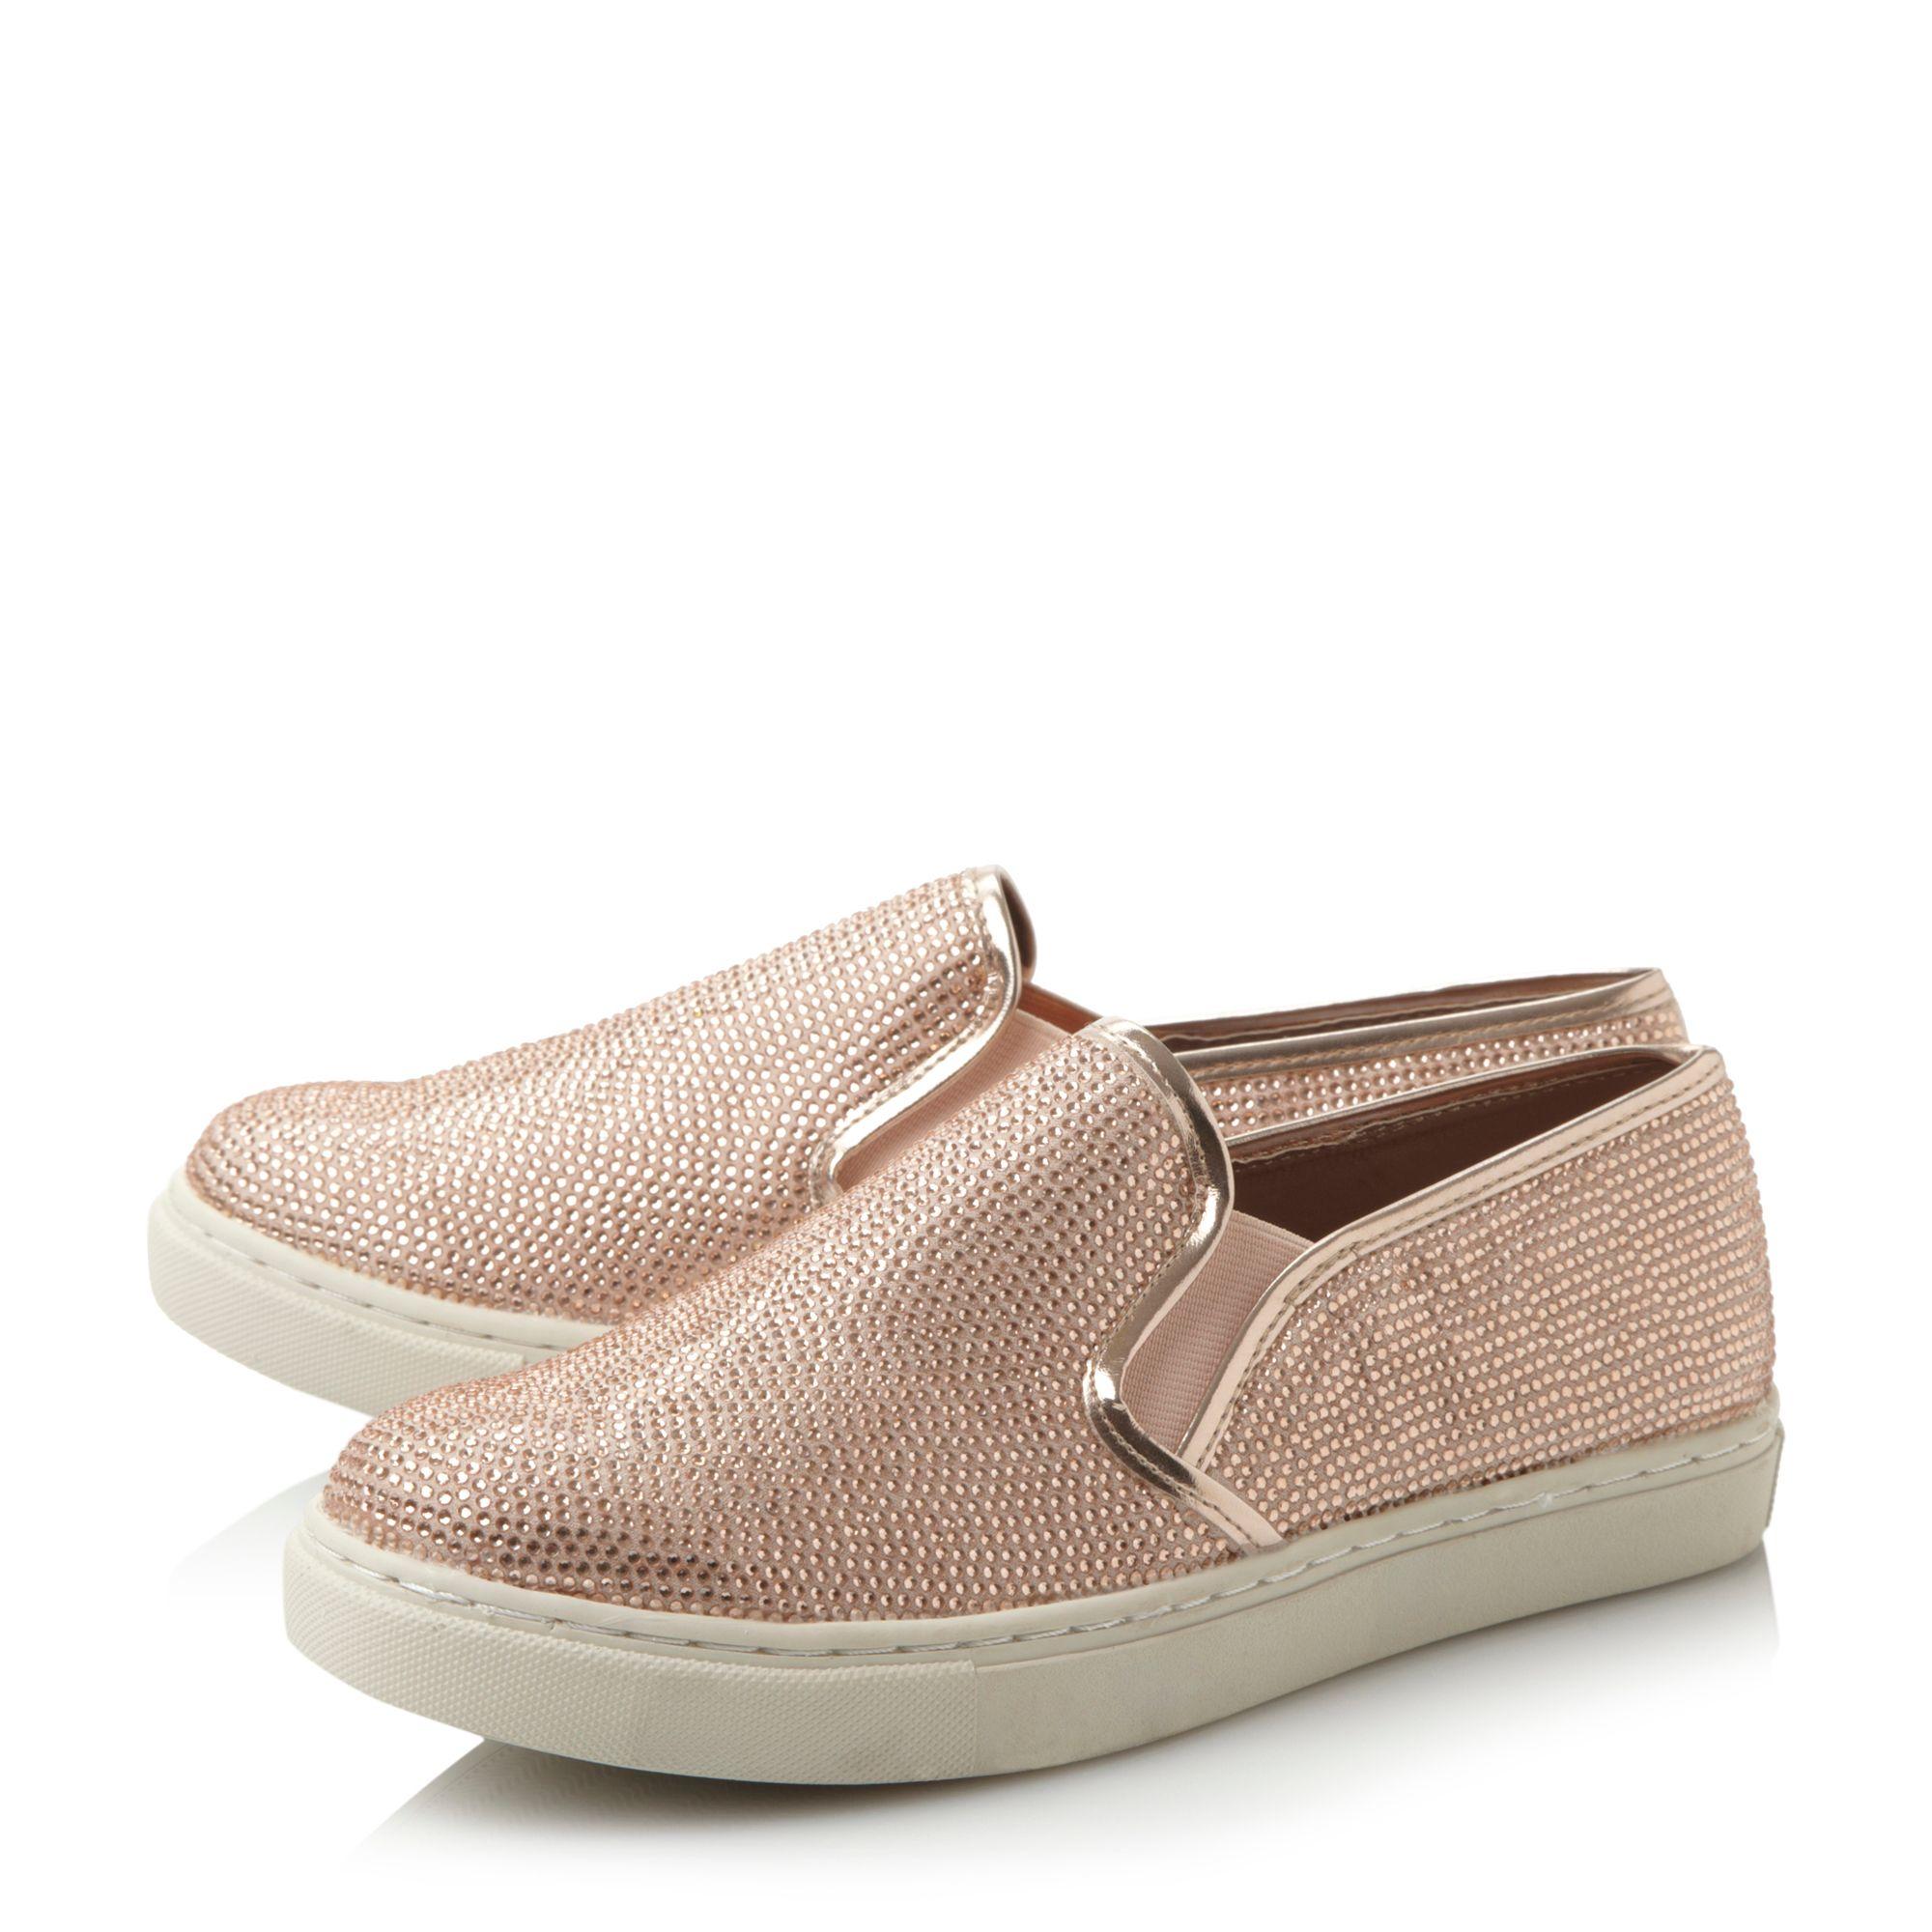 Steve Madden Exsess Rhinestone Sneakers in Rose Gold (Pink)